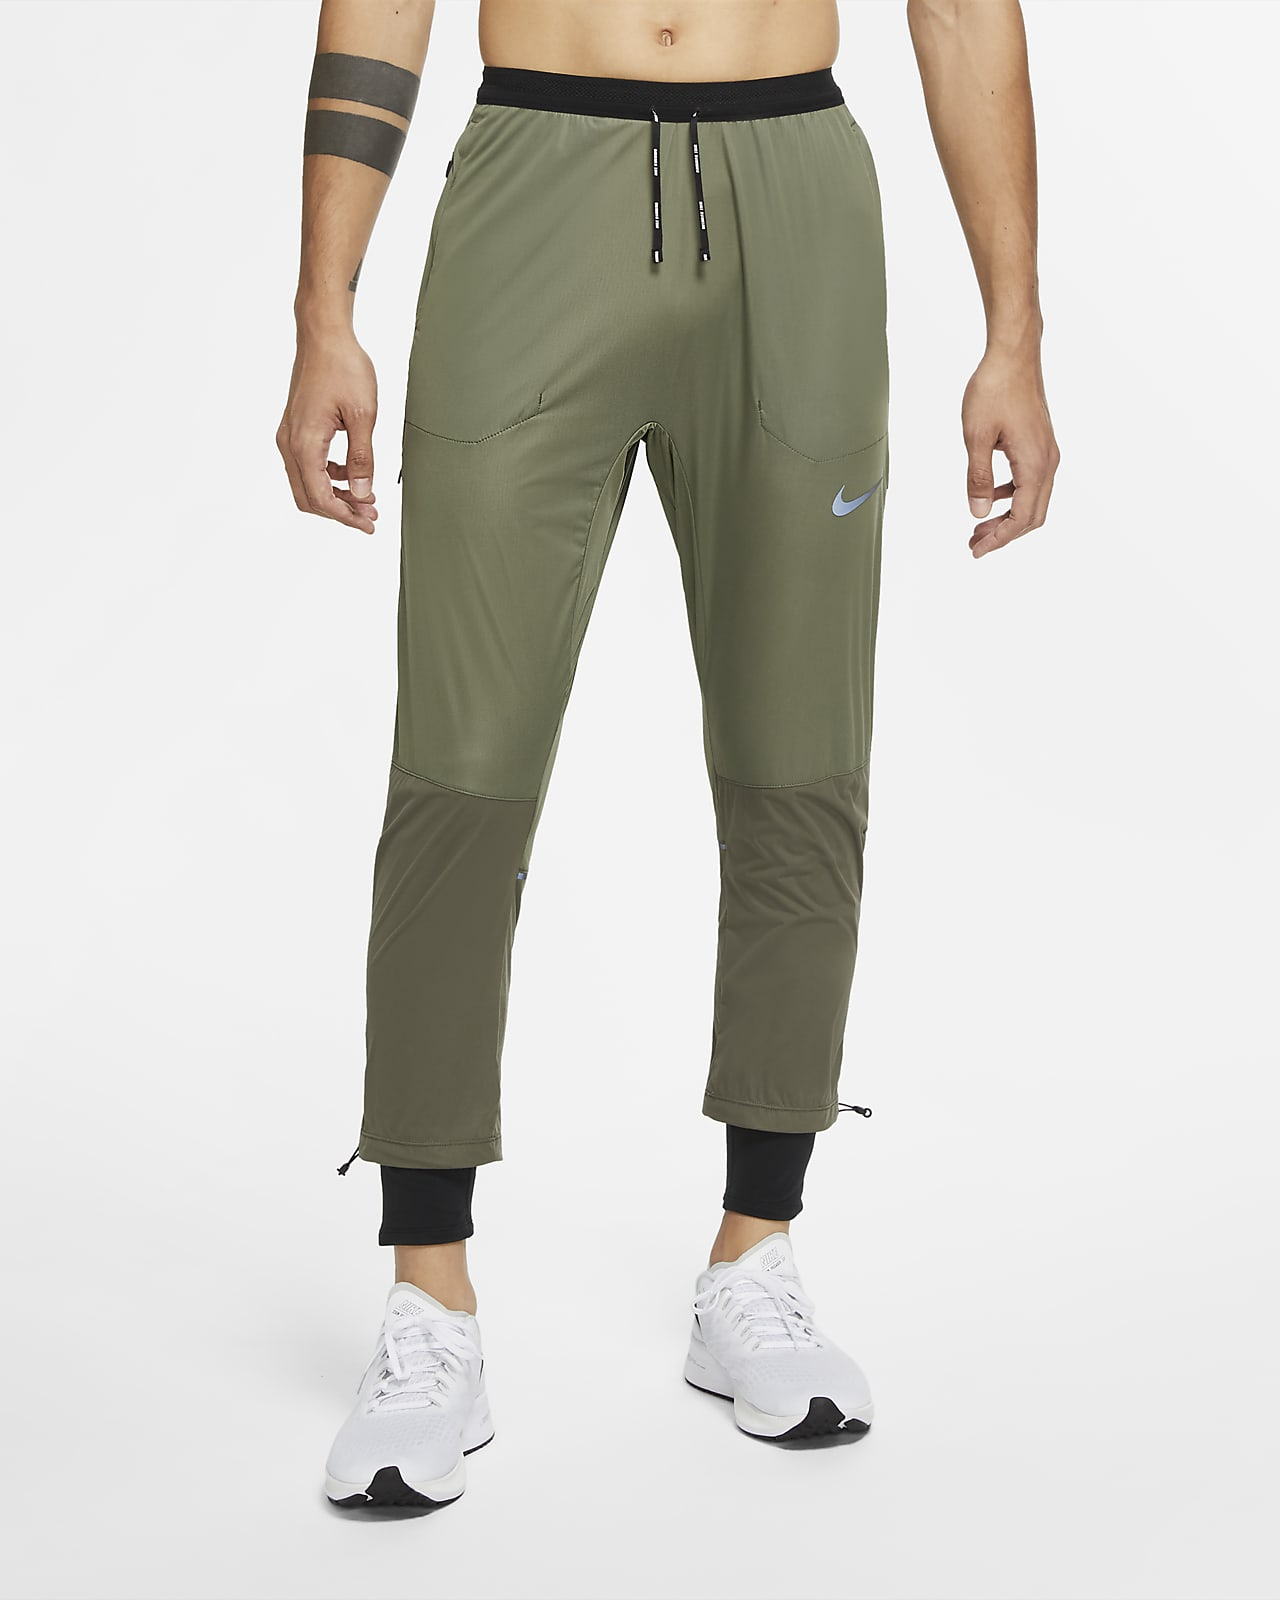 Nike Swift Shield Men's Running Pants